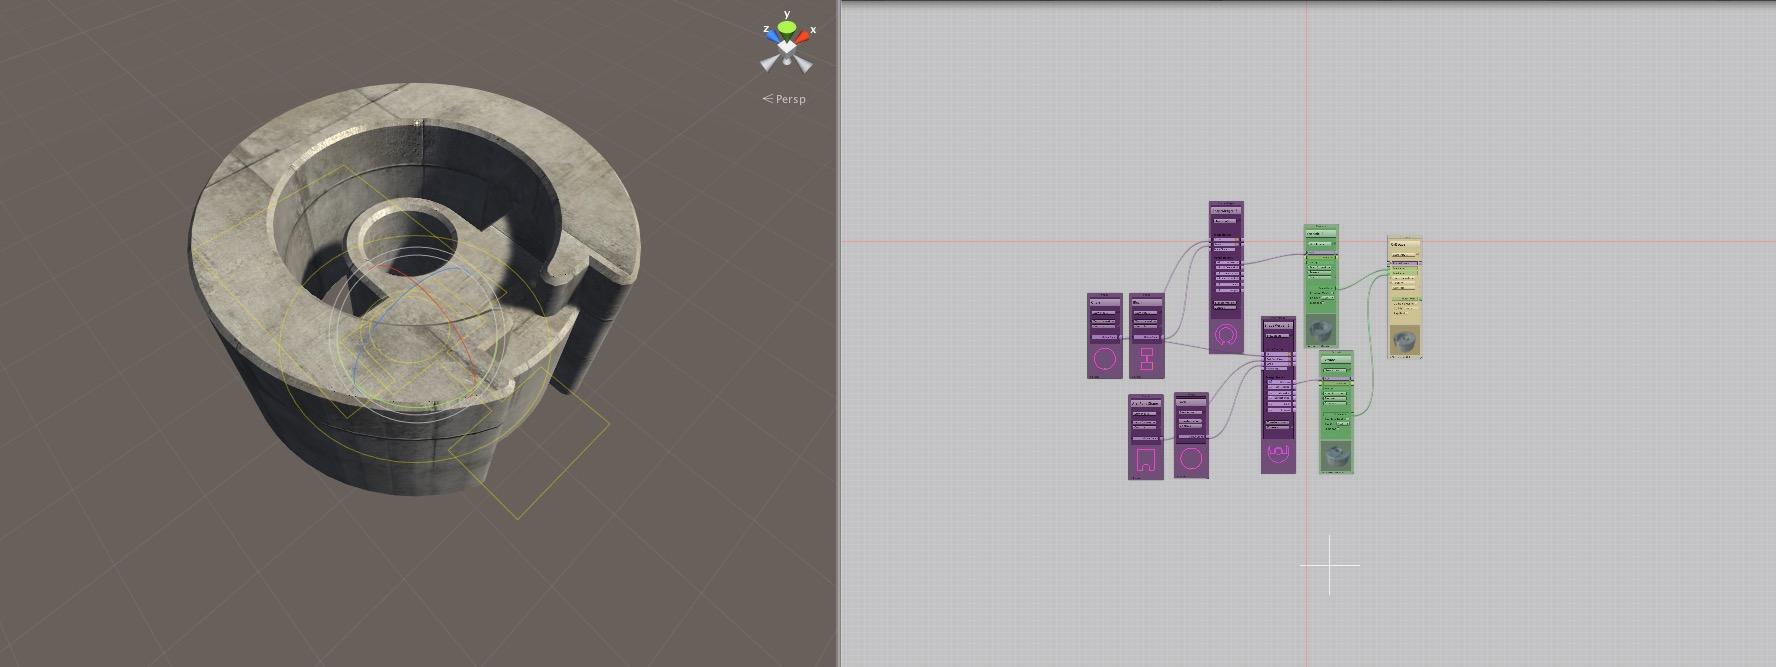 Archimatix 2015-11-23_08-20-56_AM.jpg